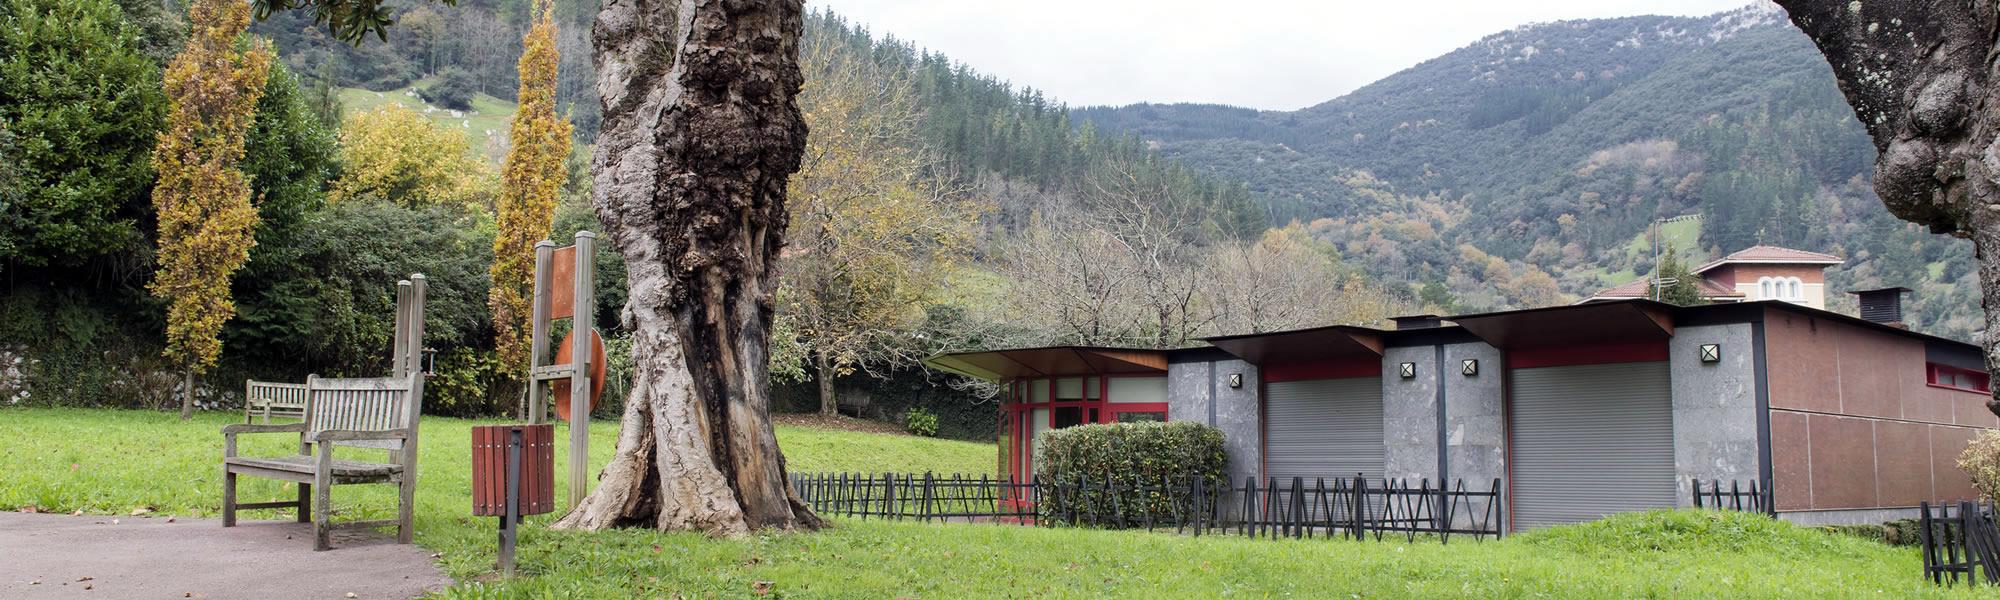 Zurekin centro para mayores - Parque exterior